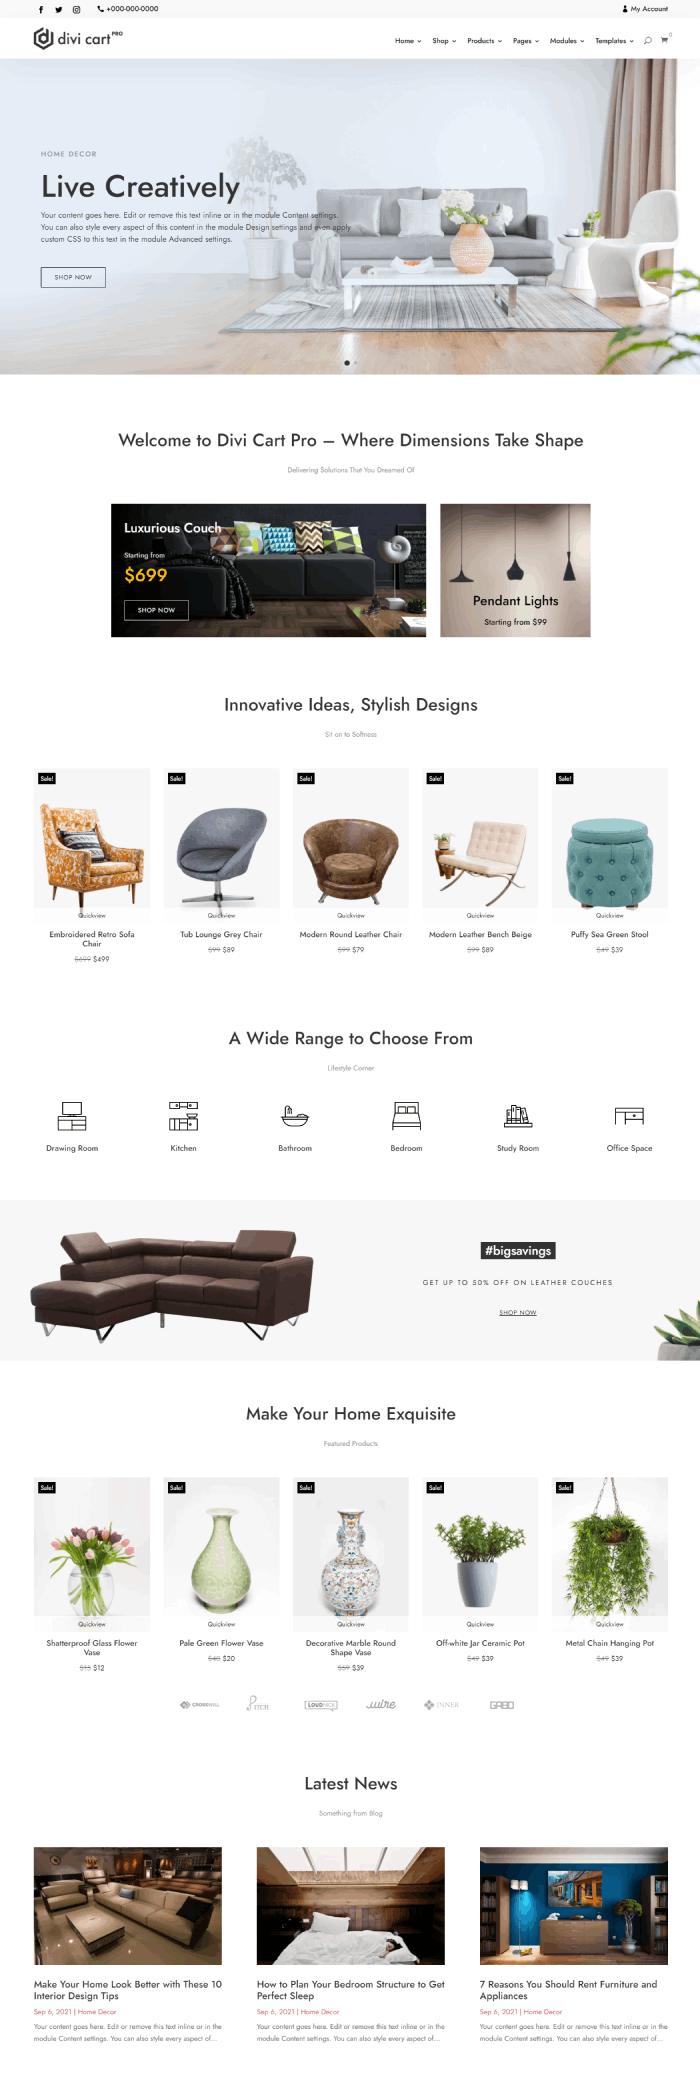 Divi Cart Pro Decor homepage